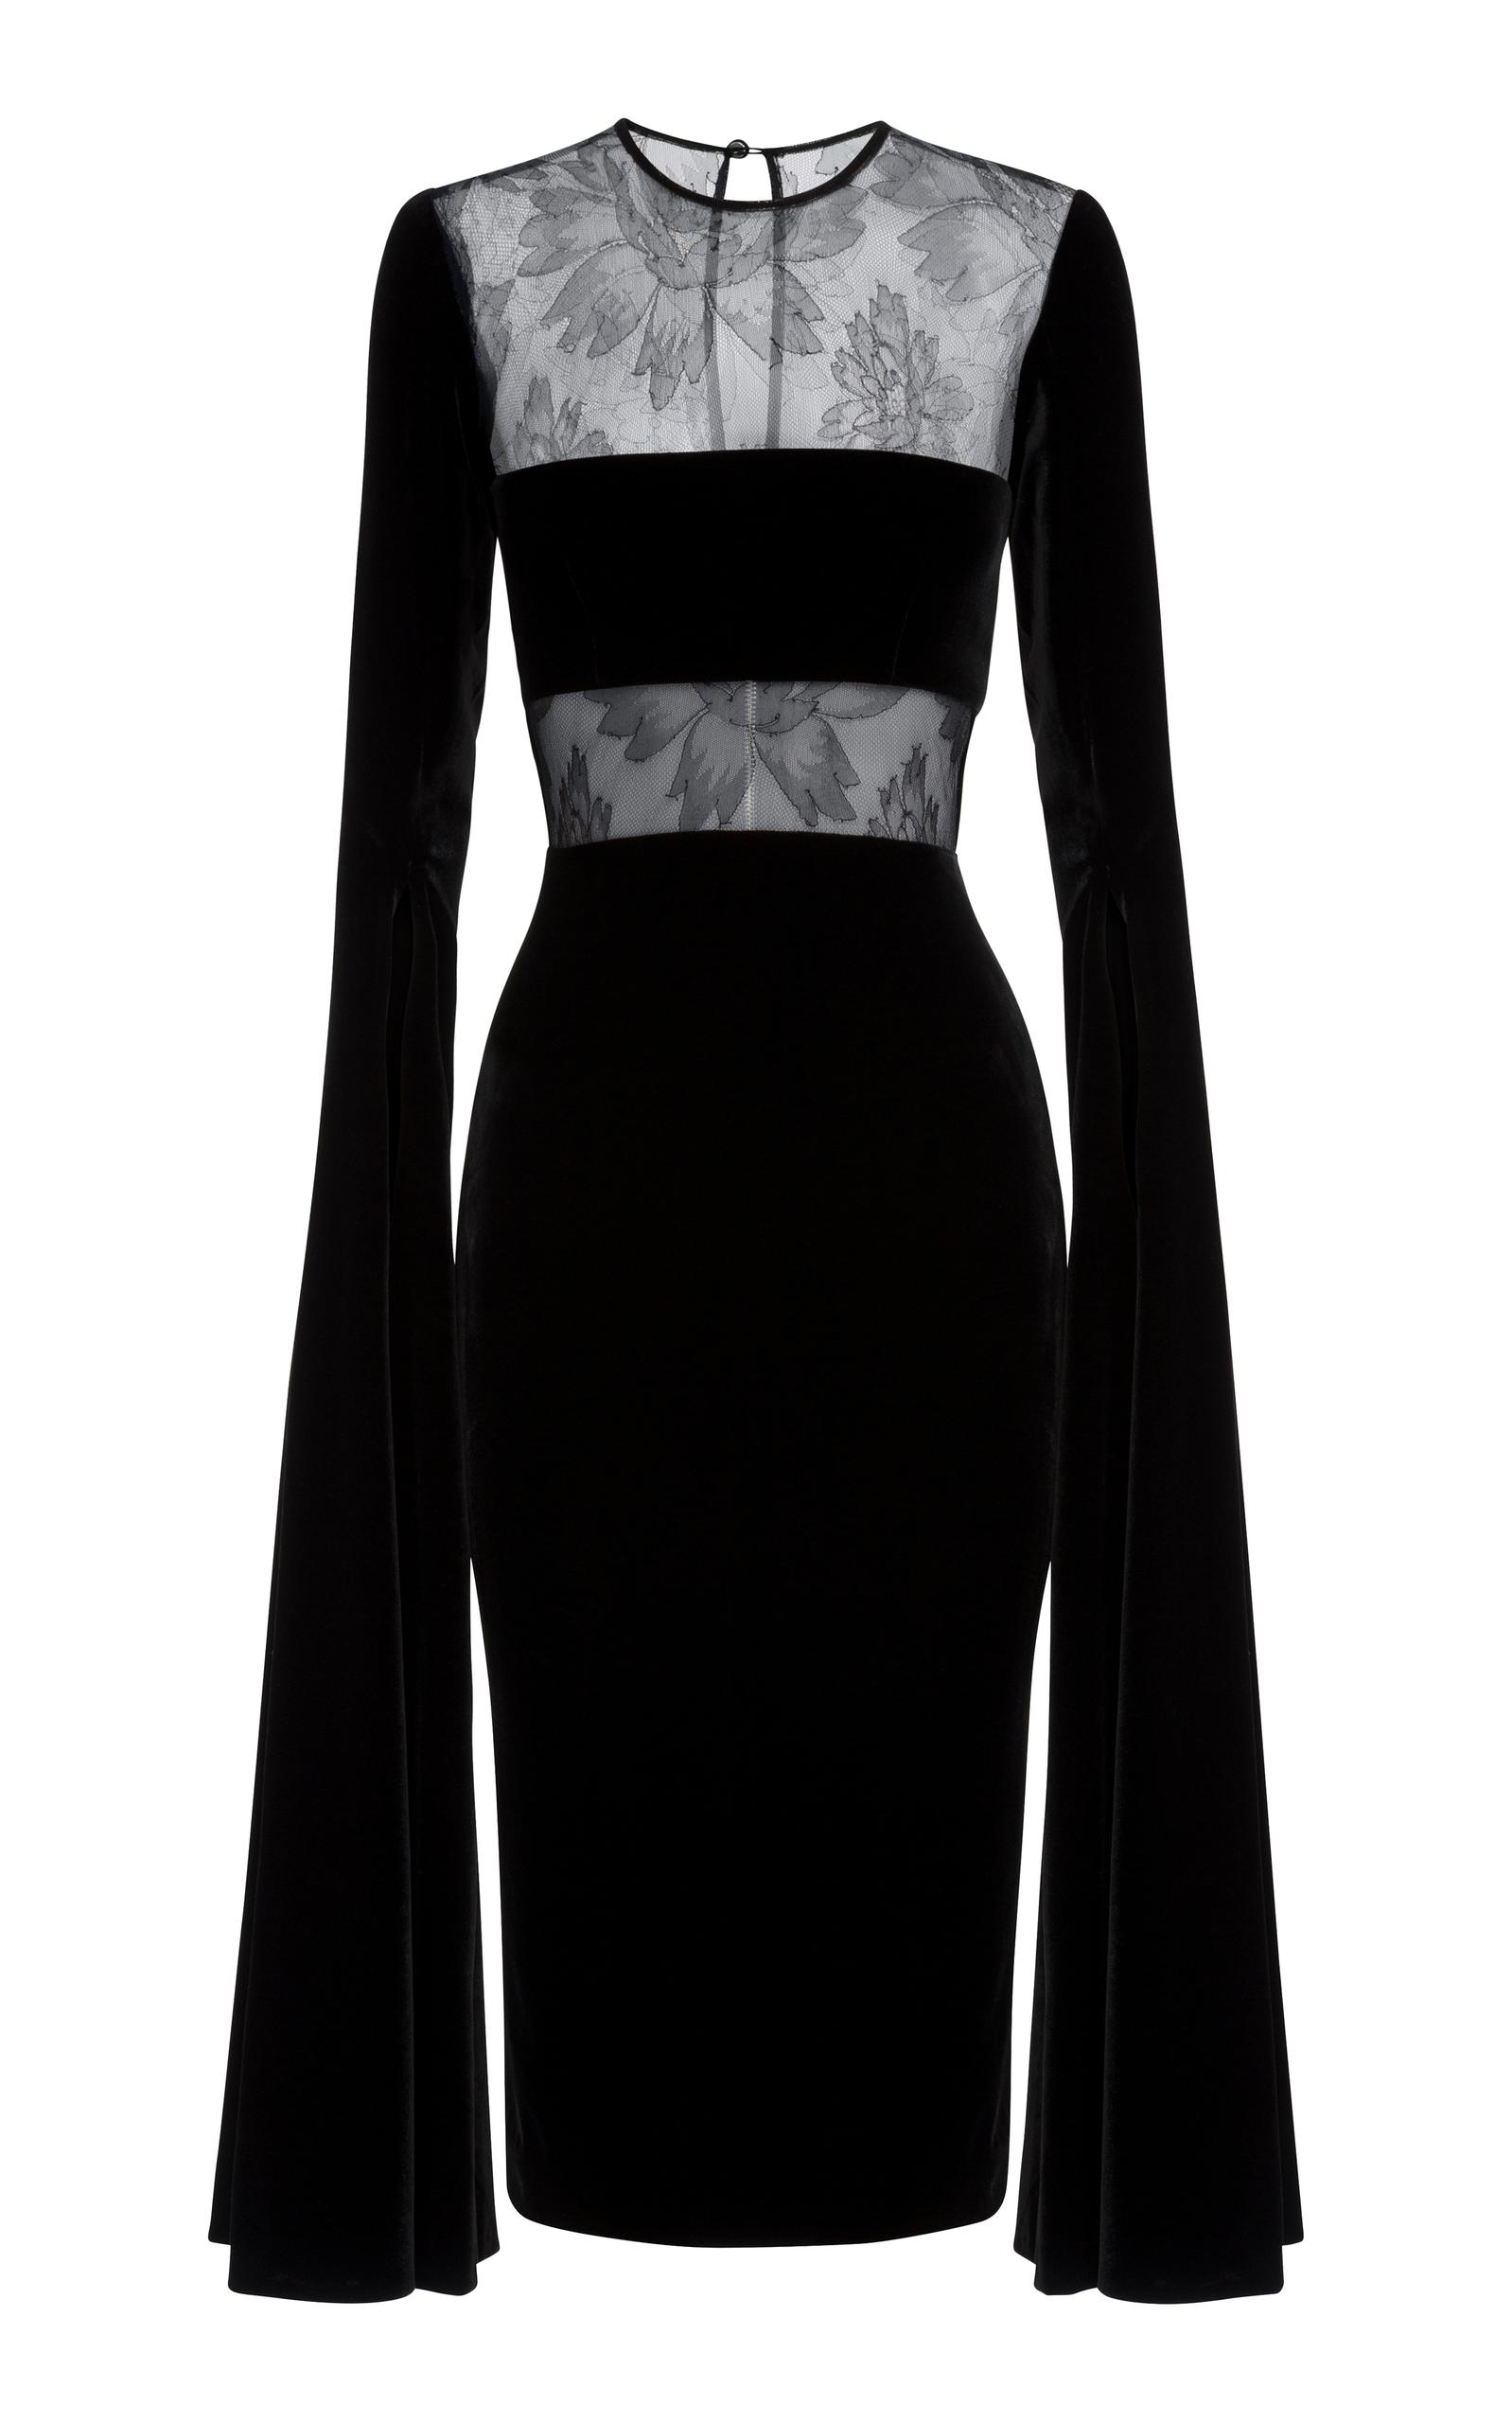 c374413ca067 Kirby Lace And Velvet Dress by Alex Perry   Moda Operandi